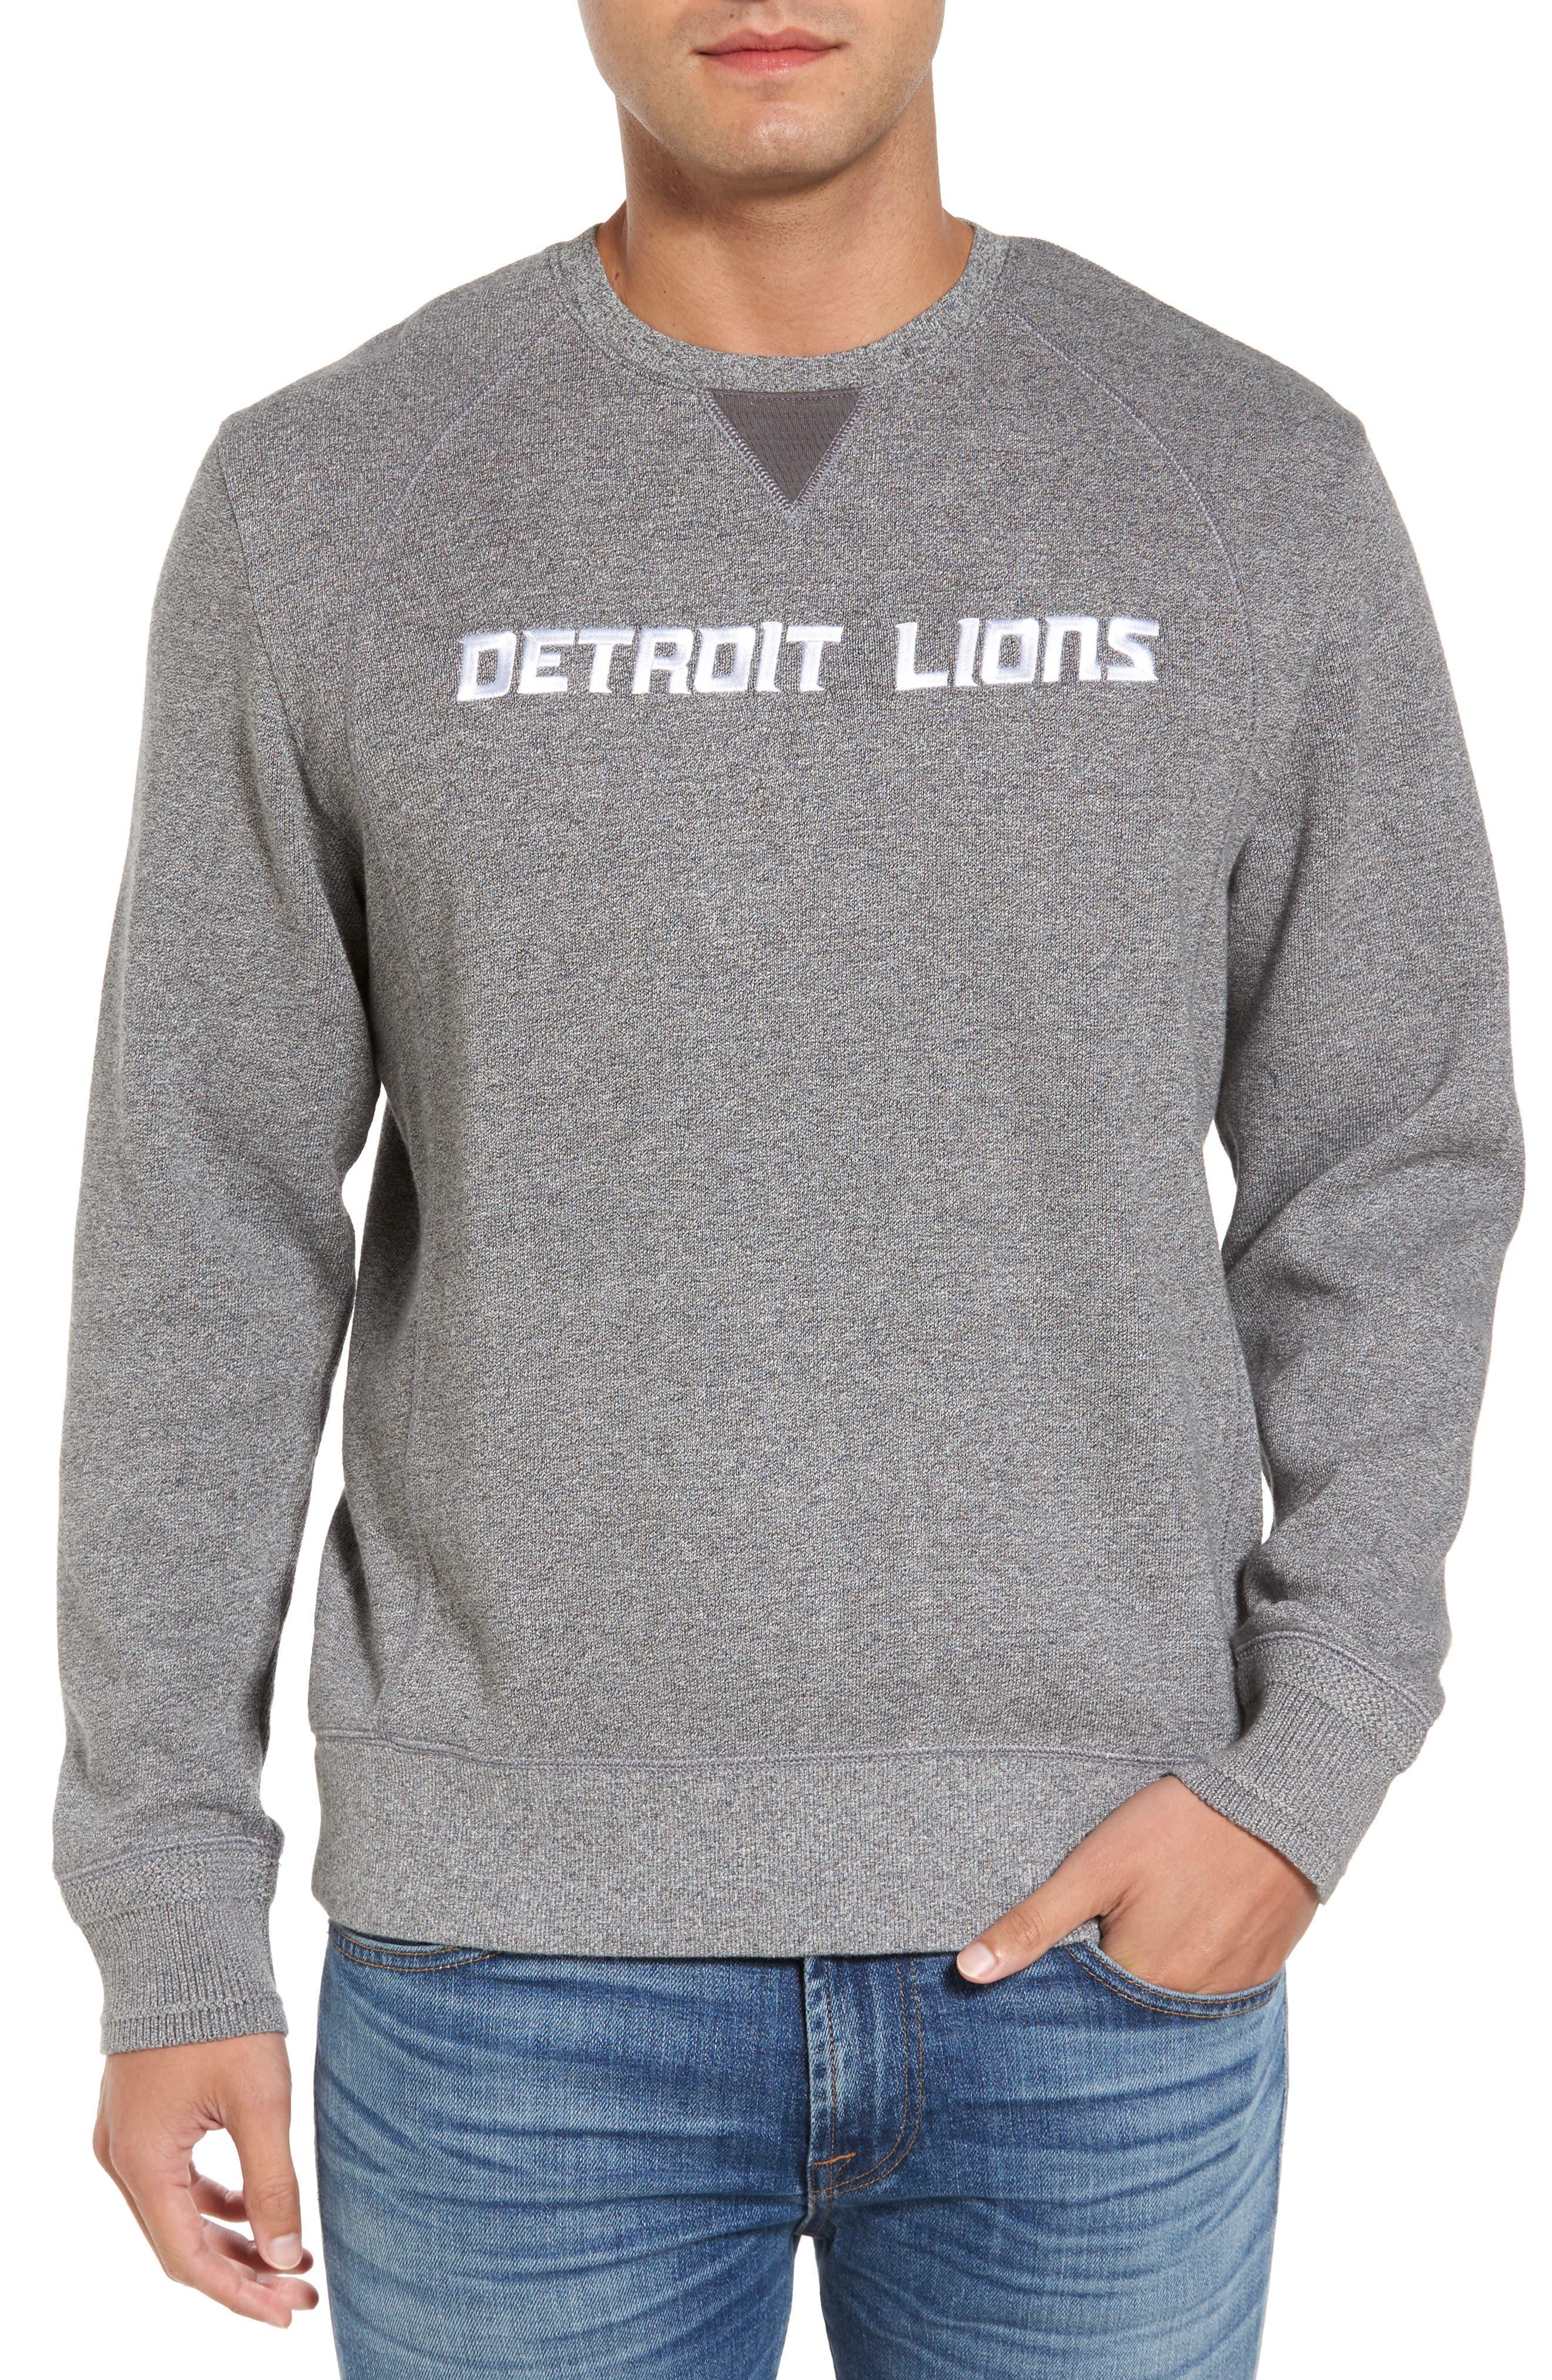 NFL Stitch of Liberty Embroidered Crewneck Sweatshirt,                             Main thumbnail 18, color,